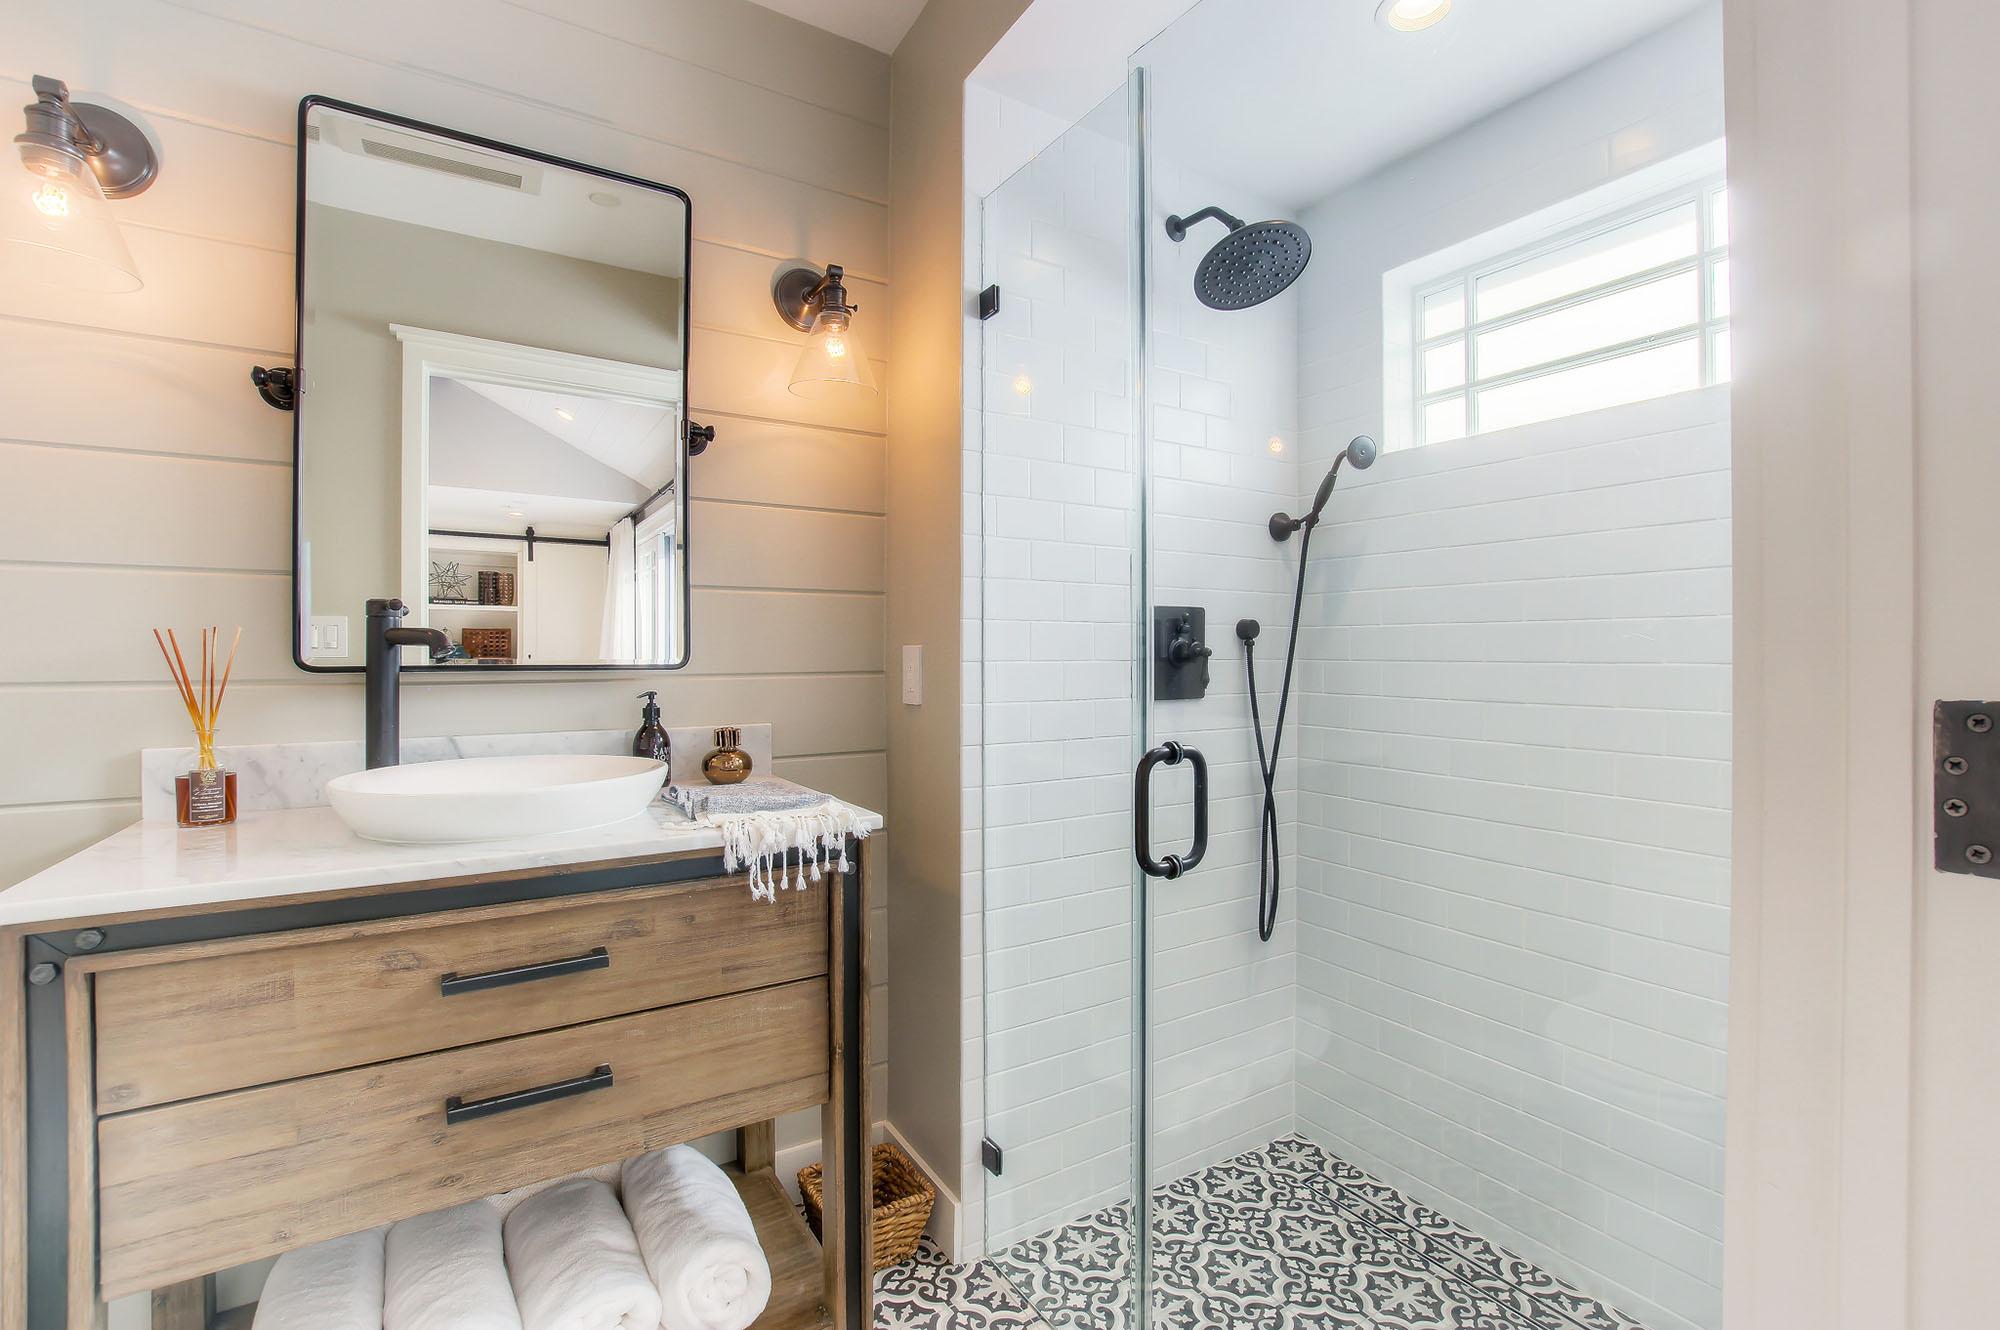 Modern farmhouse style bathroom in Santa Monica